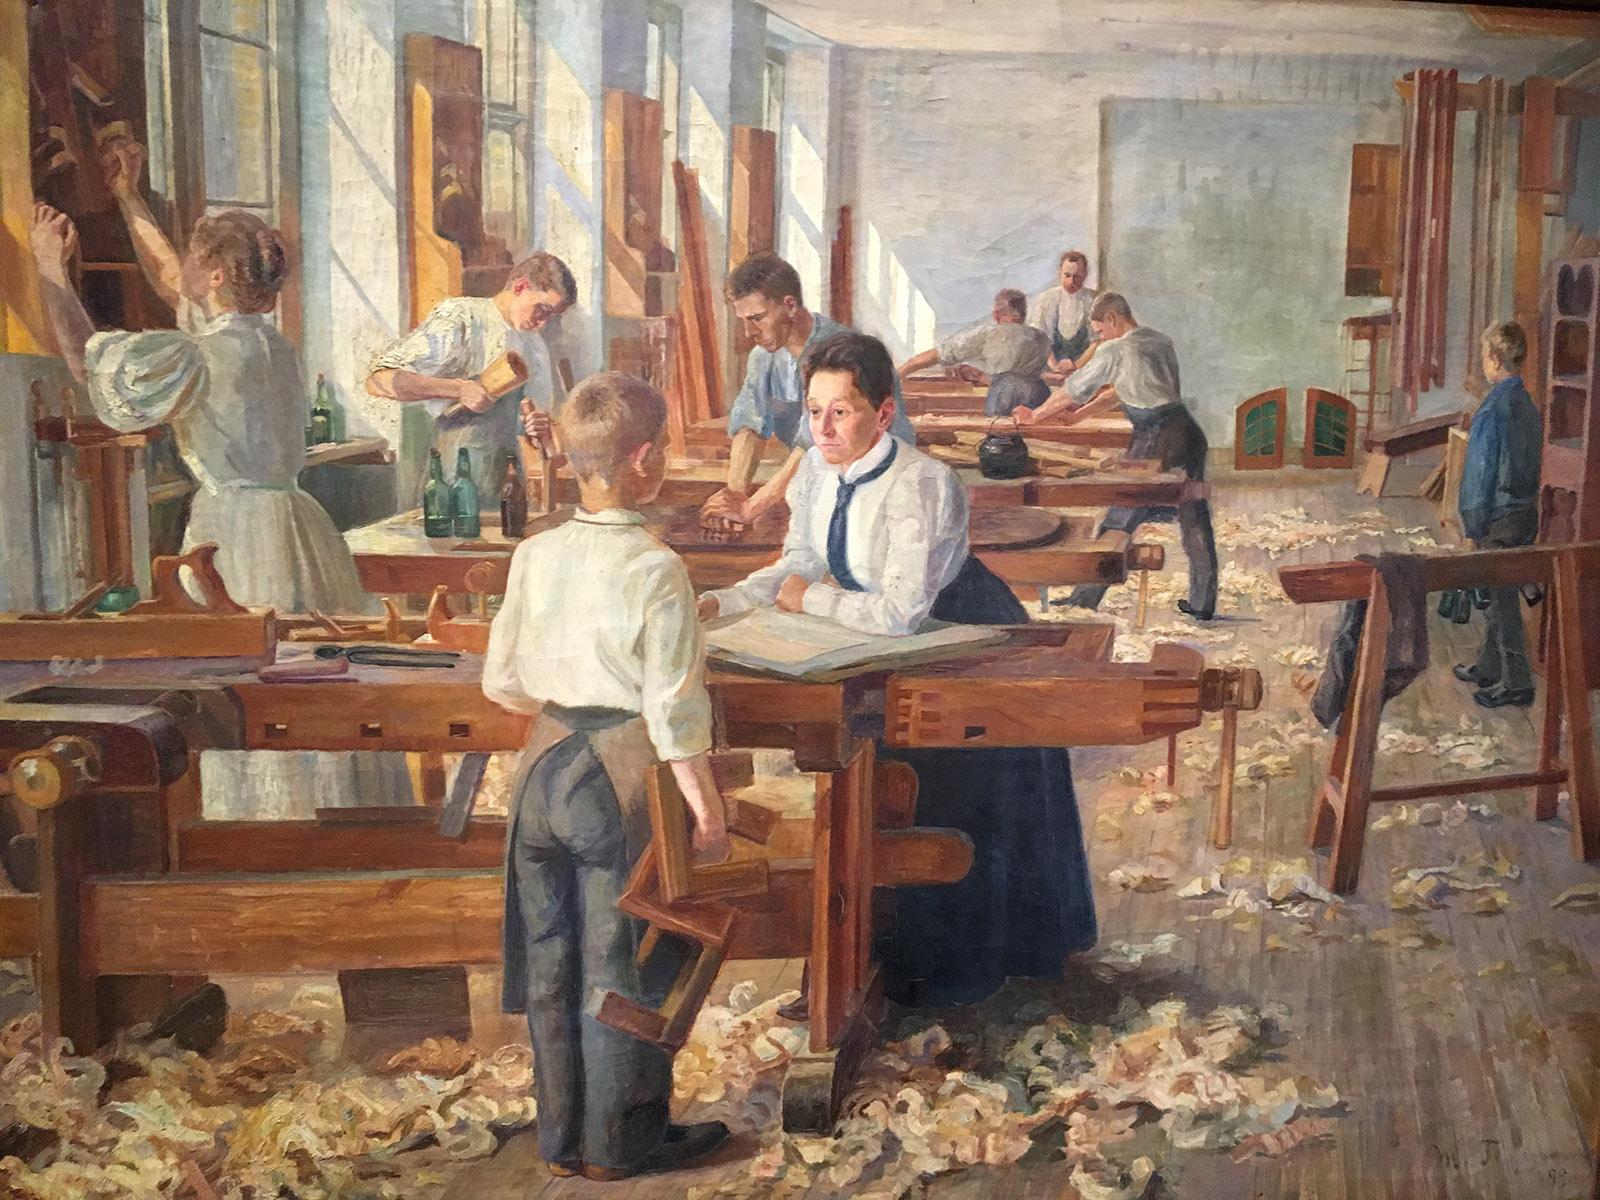 FABRICANTE FABRICARUM: Роль труда в процессе превращения